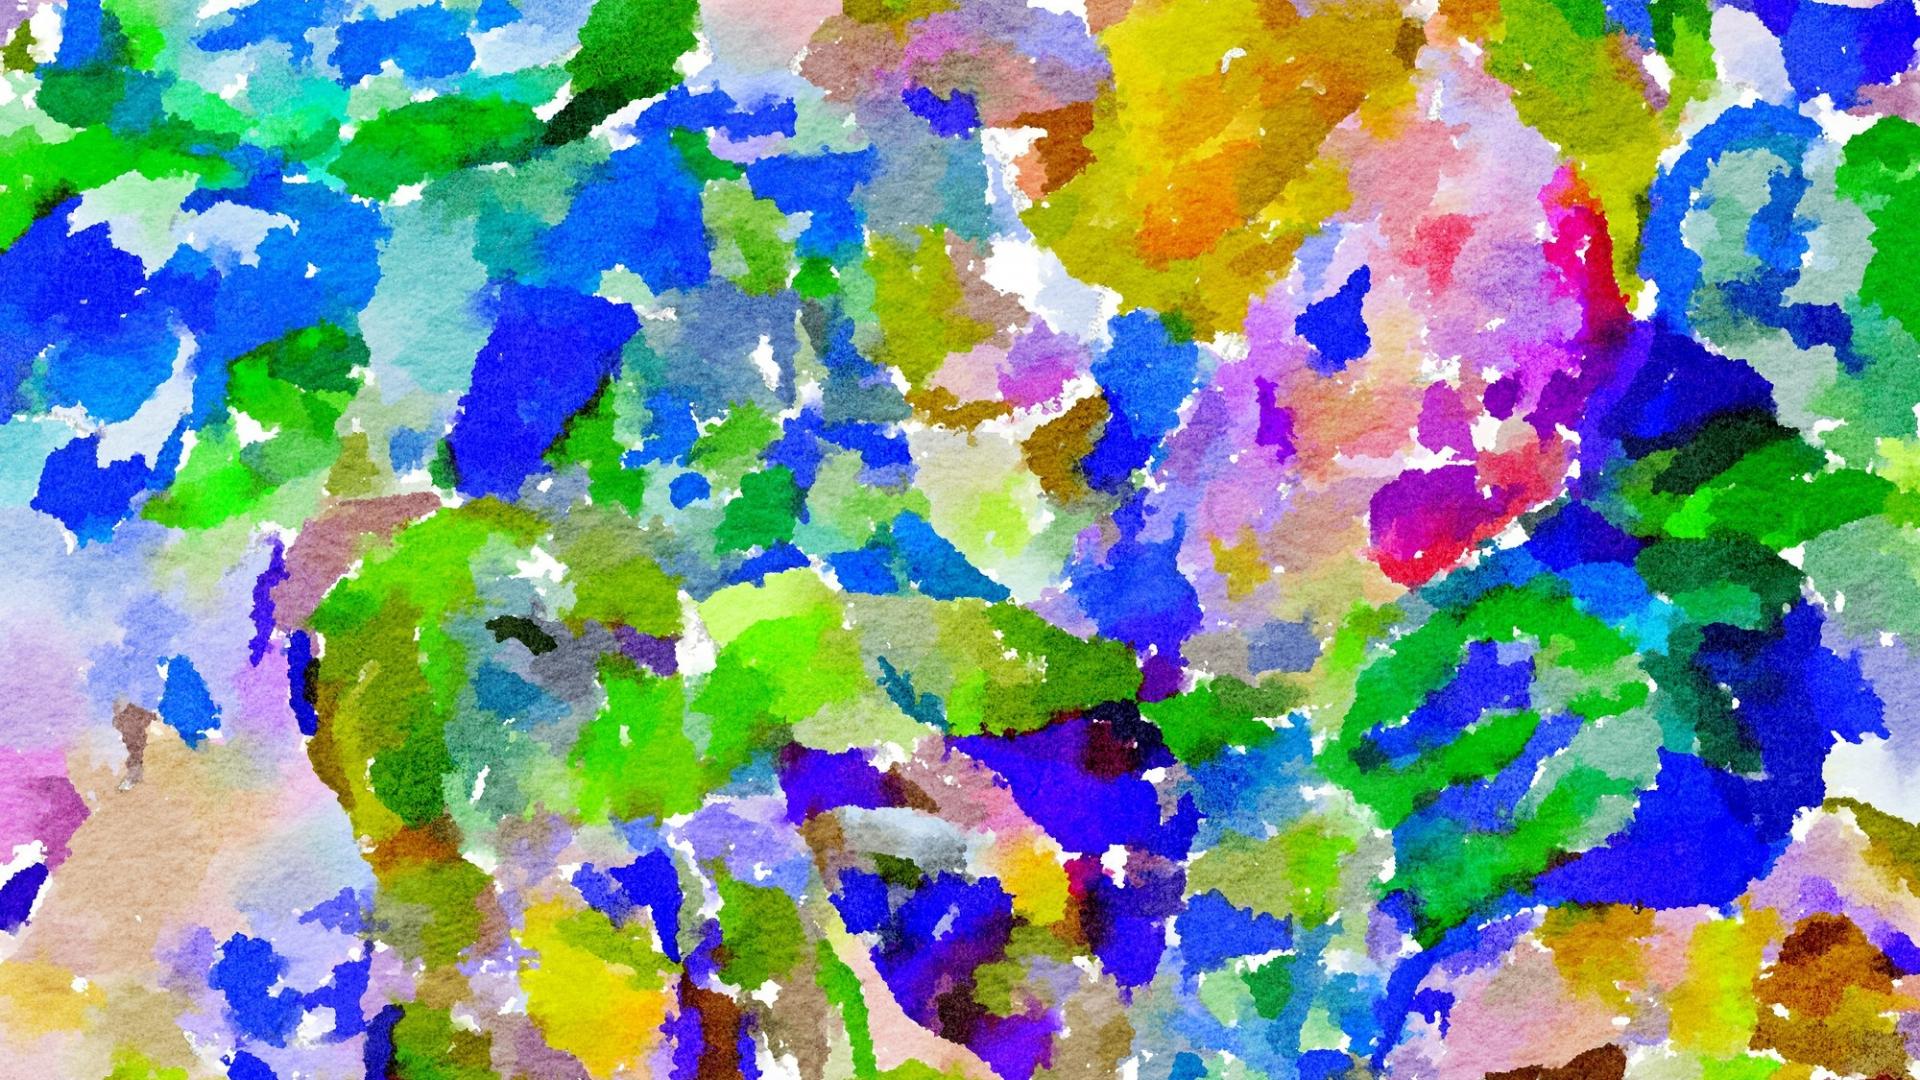 Download 1920x1080 Wallpaper Art Pattern Colorful